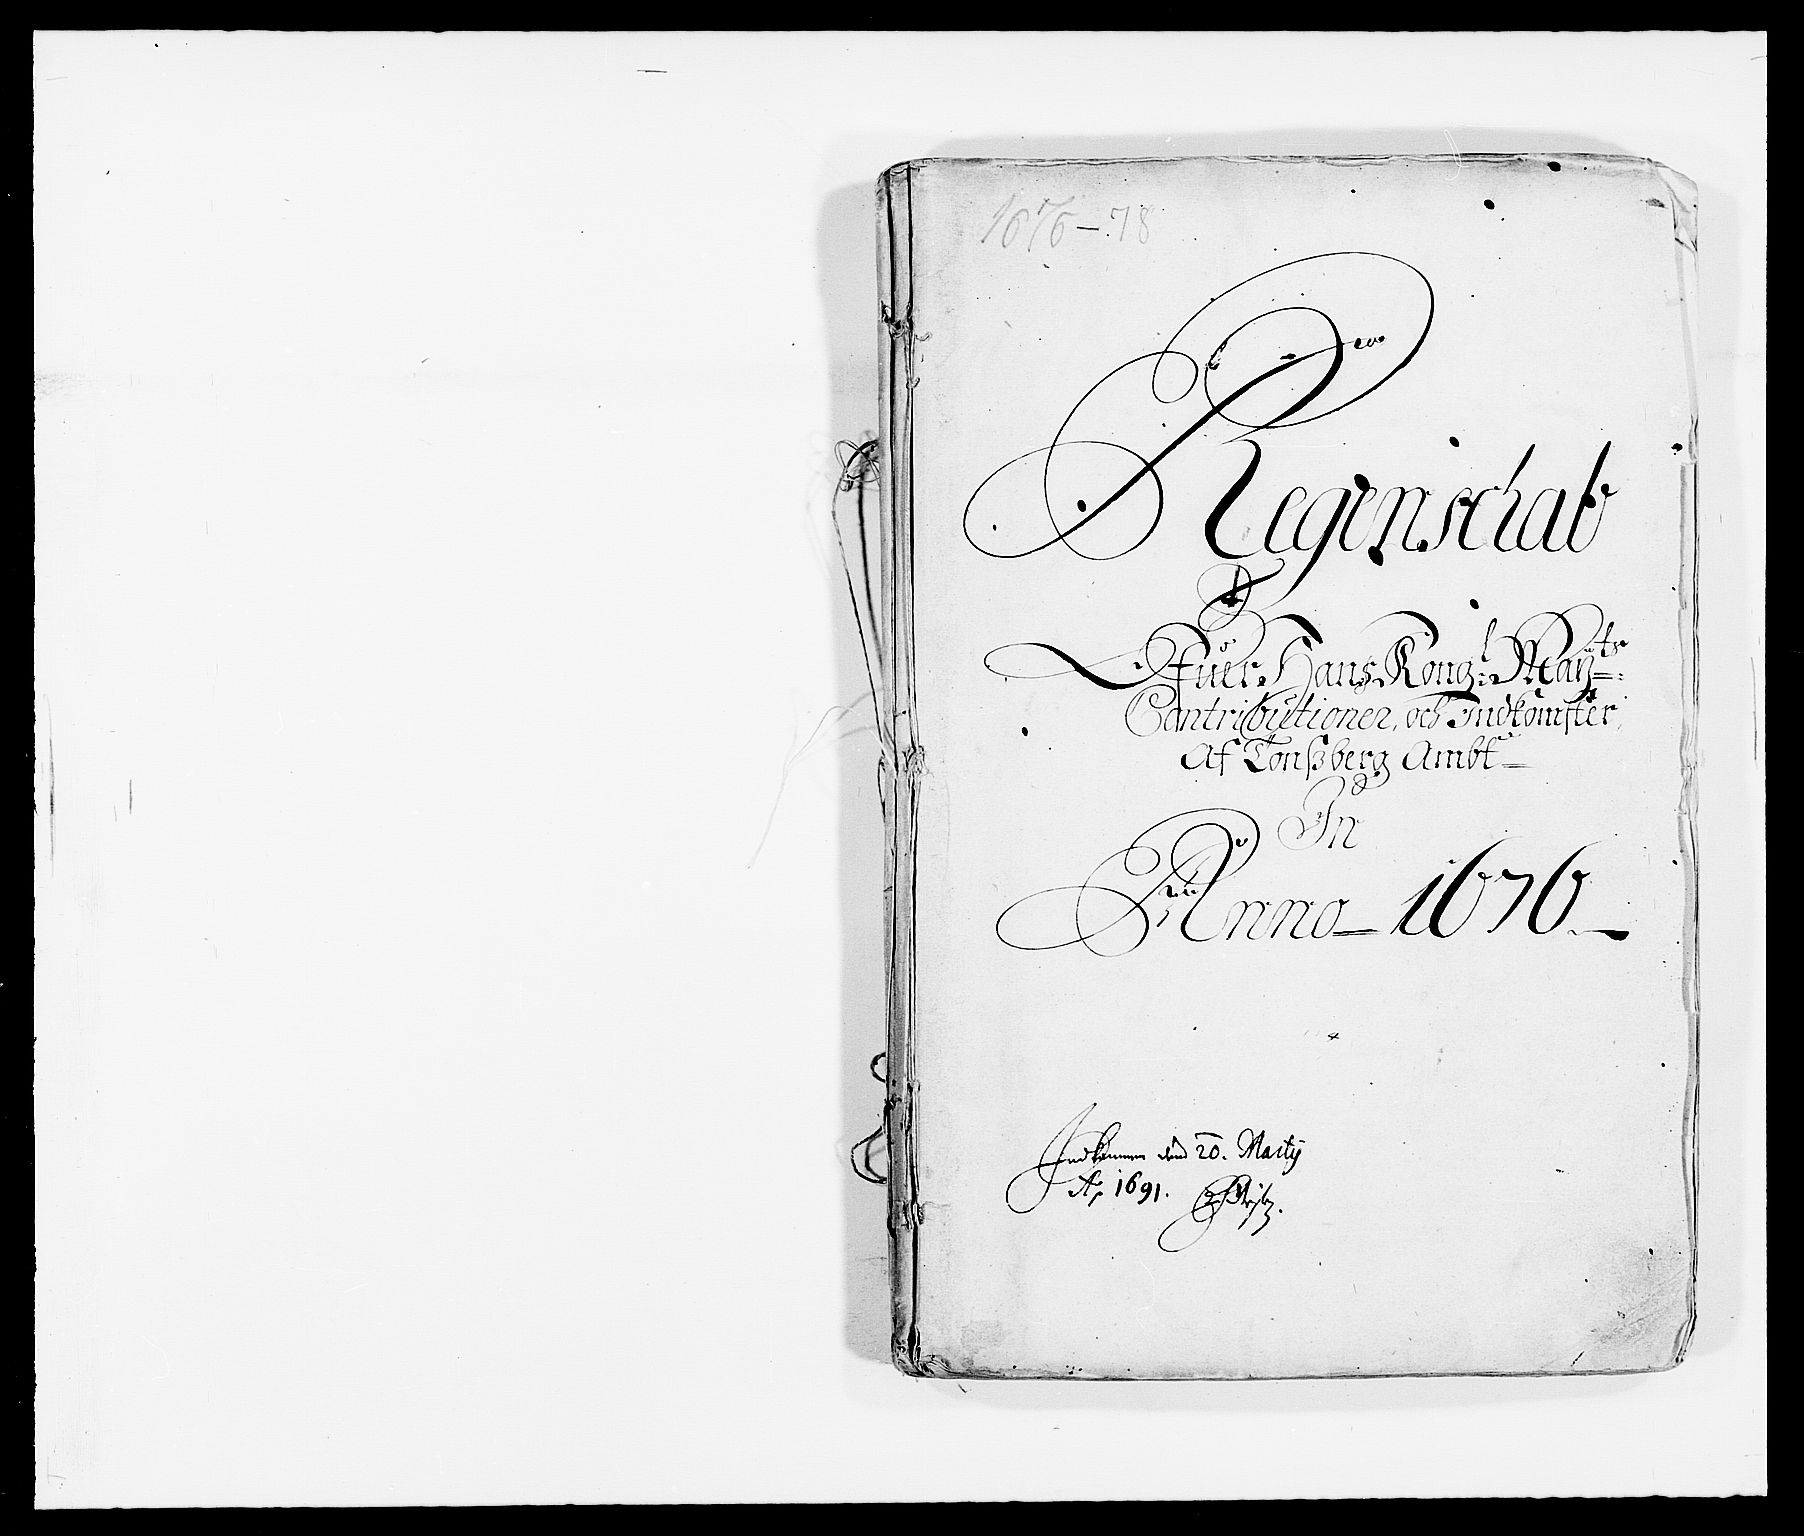 RA, Rentekammeret inntil 1814, Reviderte regnskaper, Fogderegnskap, R32/L1845: Fogderegnskap Jarlsberg grevskap, 1676-1678, s. 1